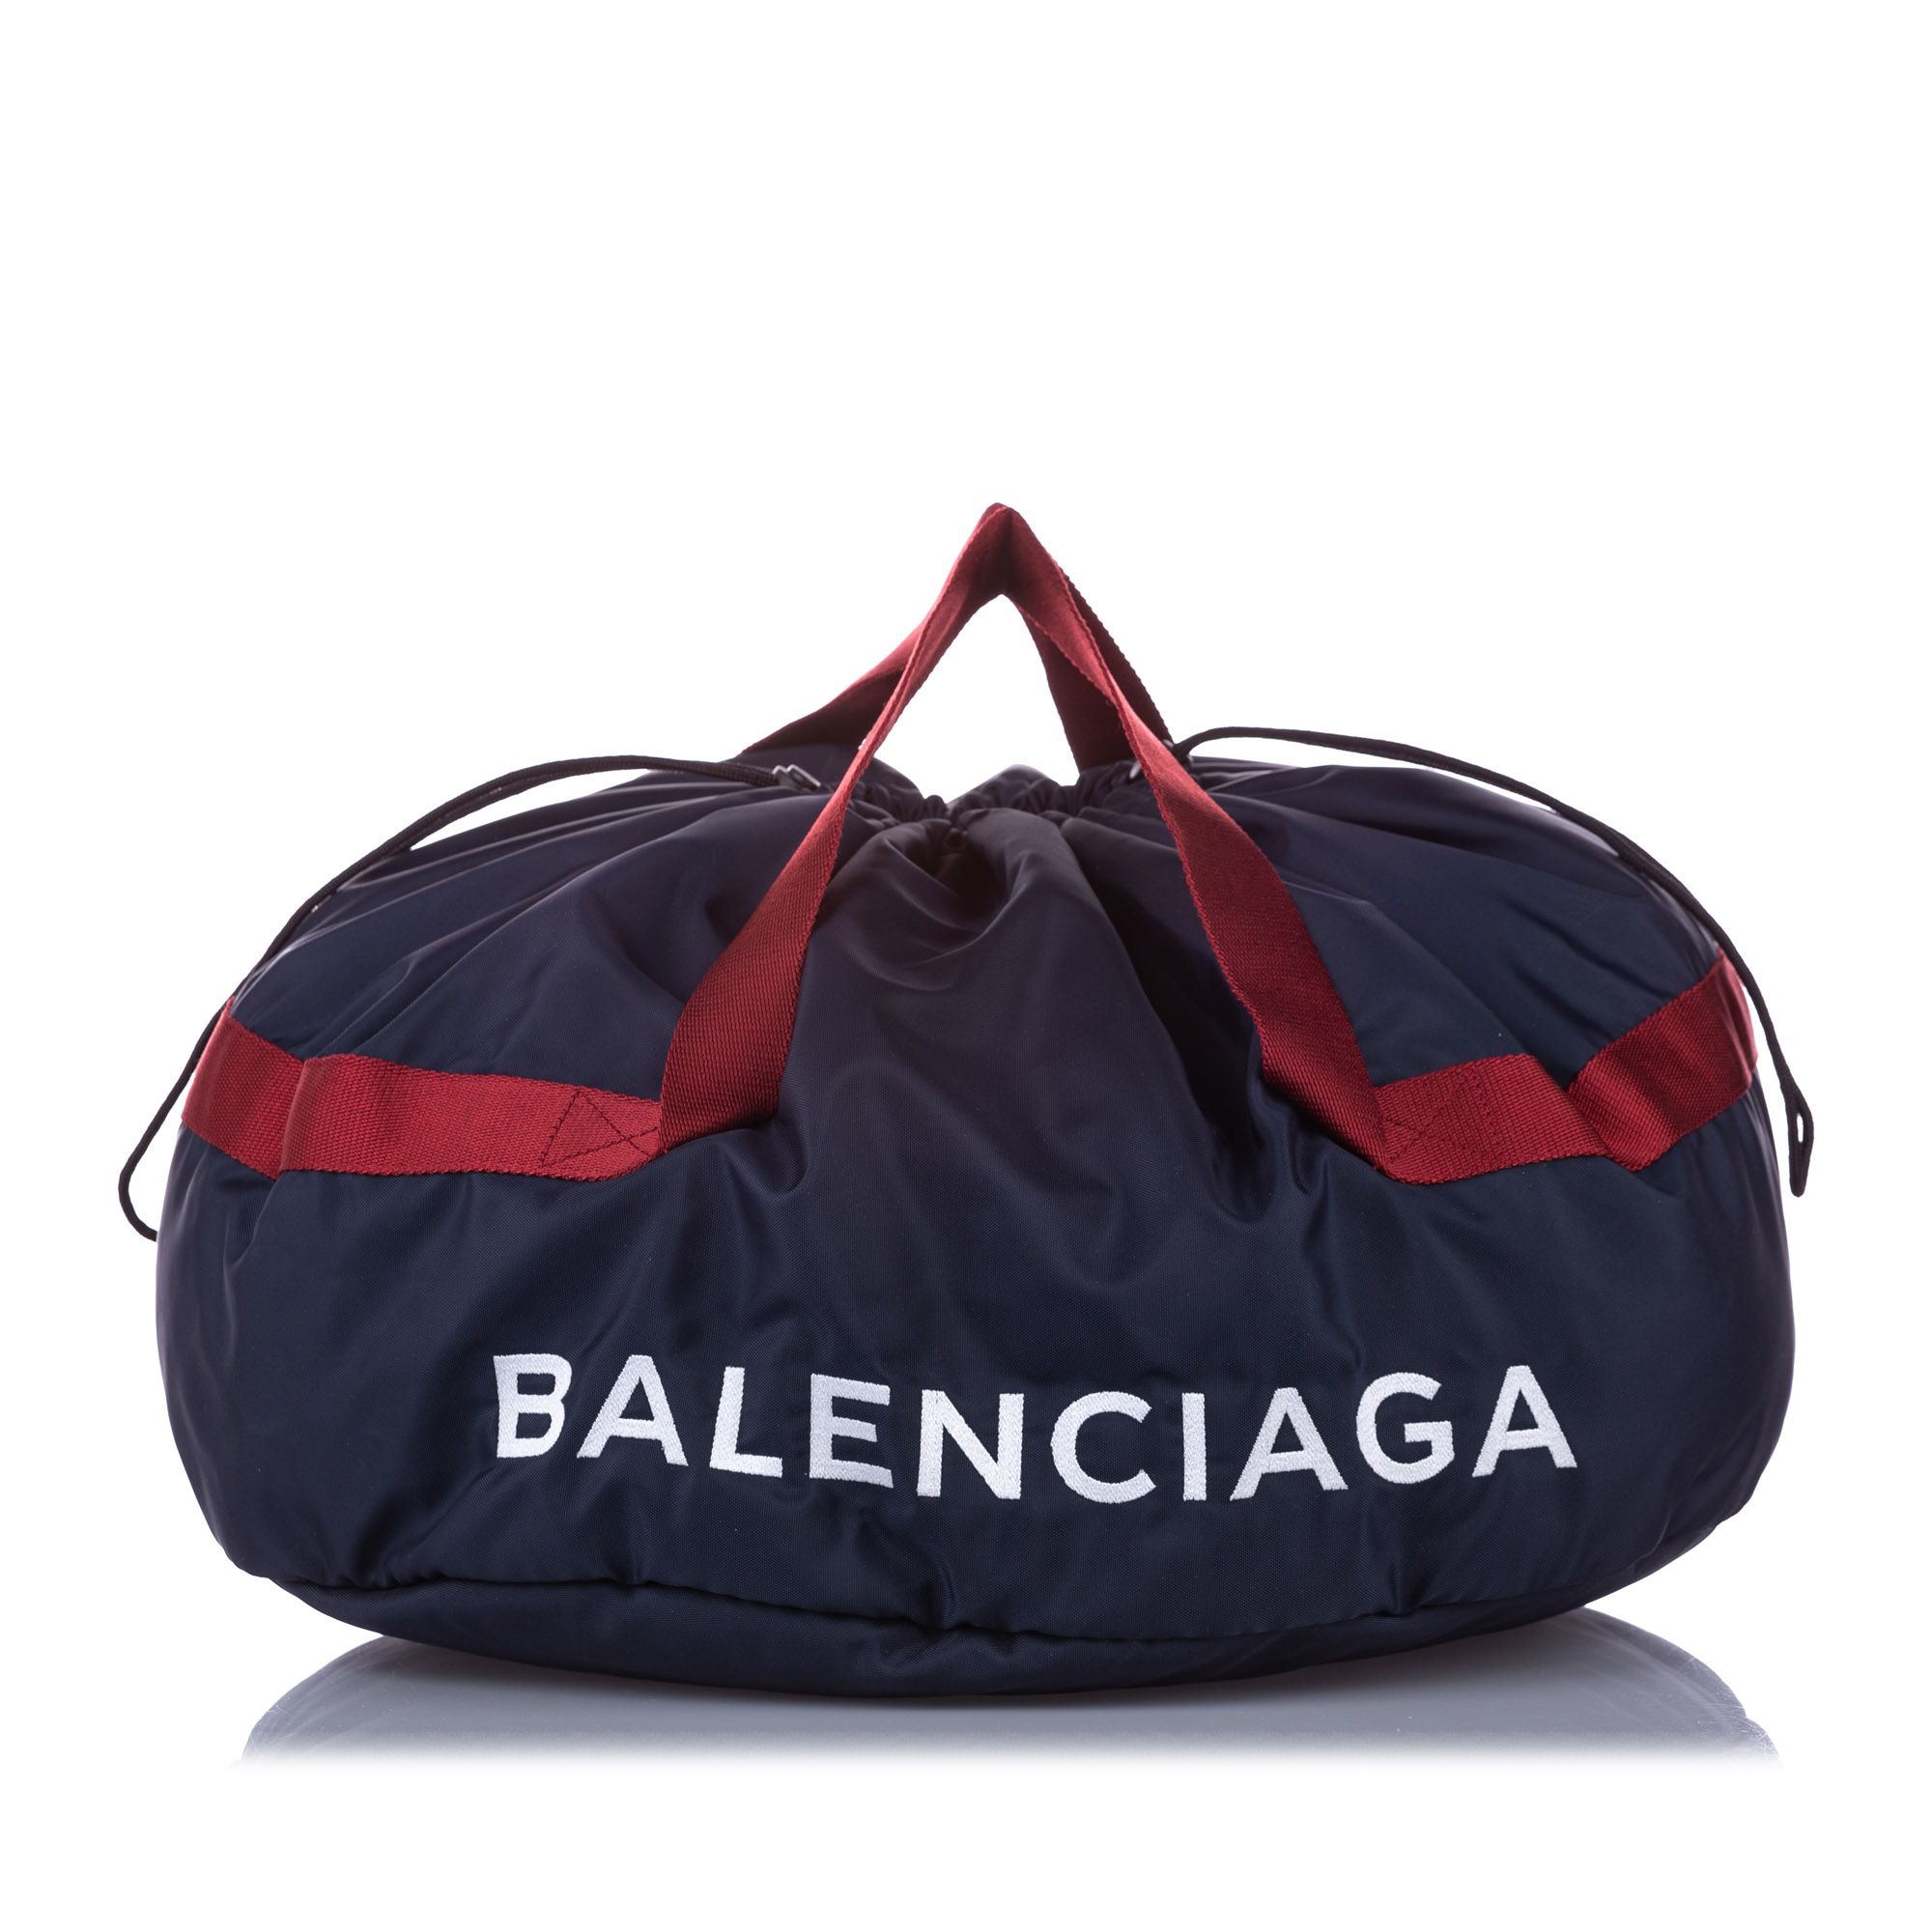 Balenciaga S Wheel Everyday Nylon Travel Bag Black